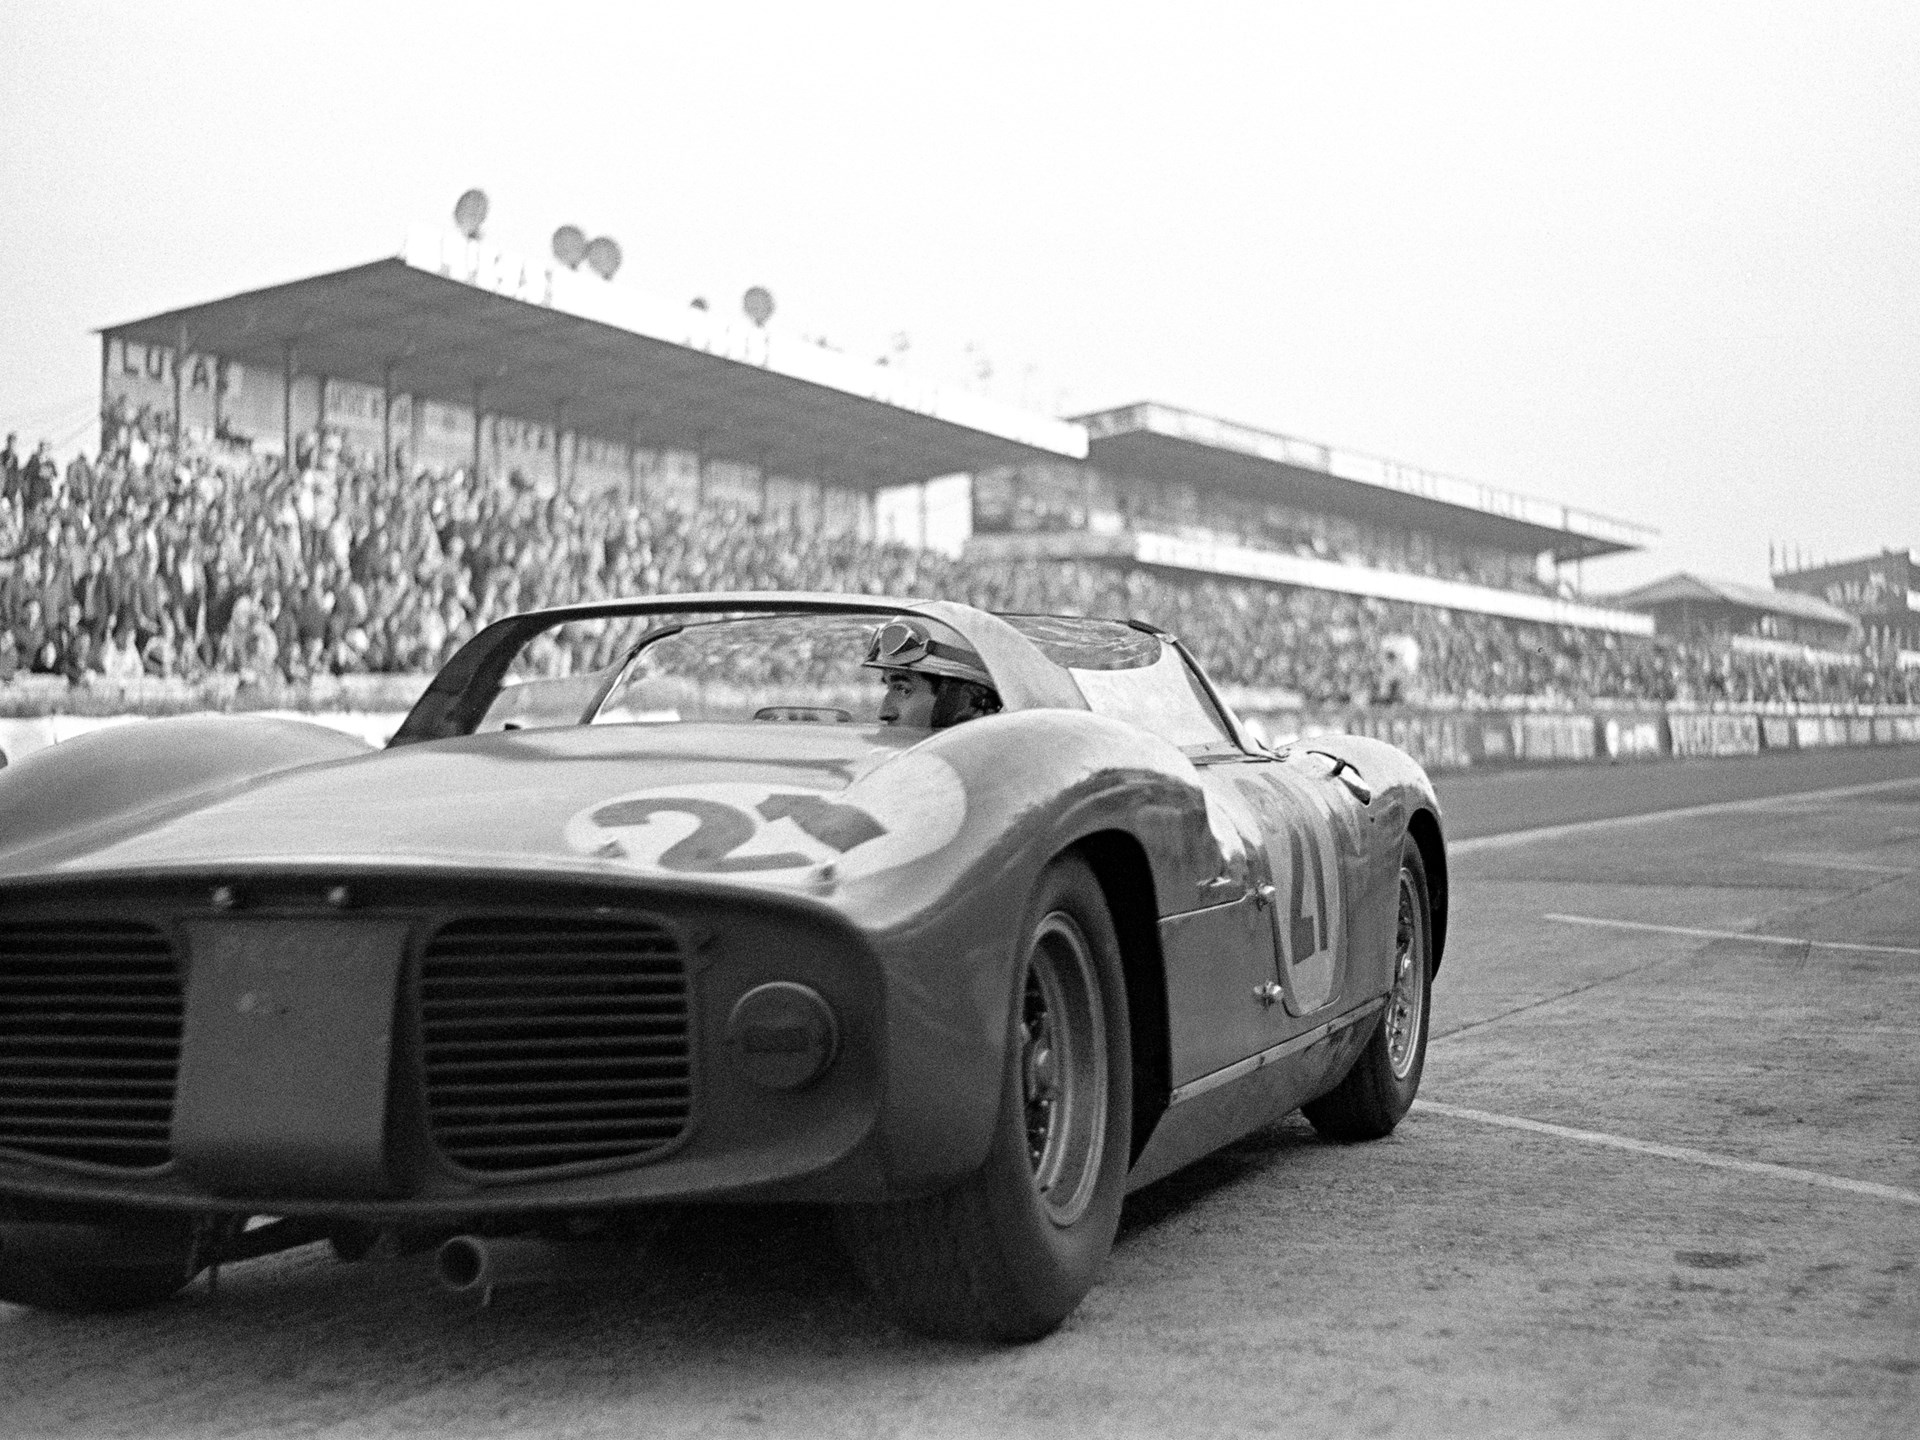 24 Hours of Le Mans, #21, Ludovico Scarfiotti/Lorenzo Bandini, 1st Overall.